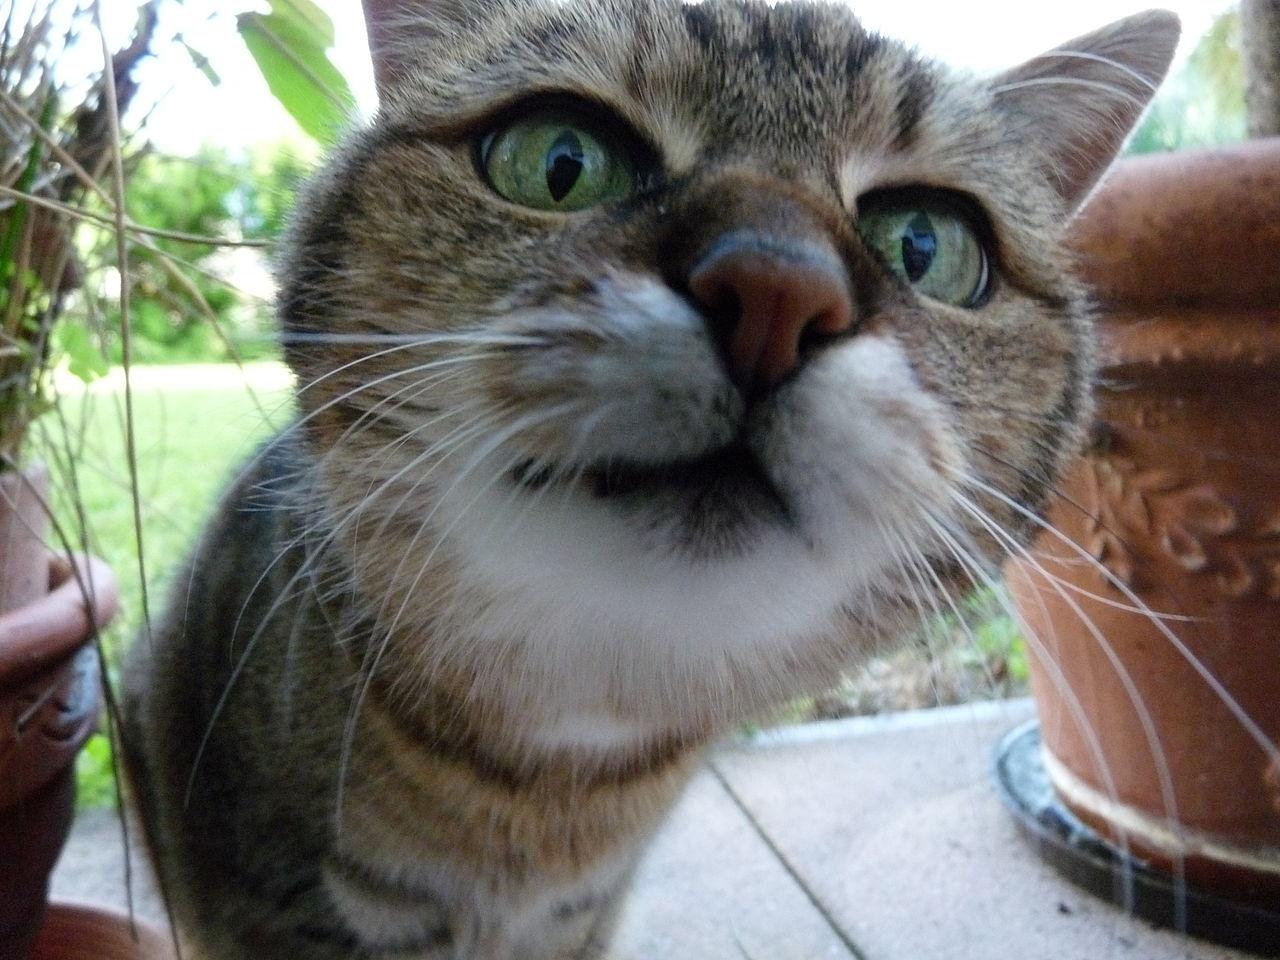 File:Neugierige-Katze.JPG - Wikimedia Commons